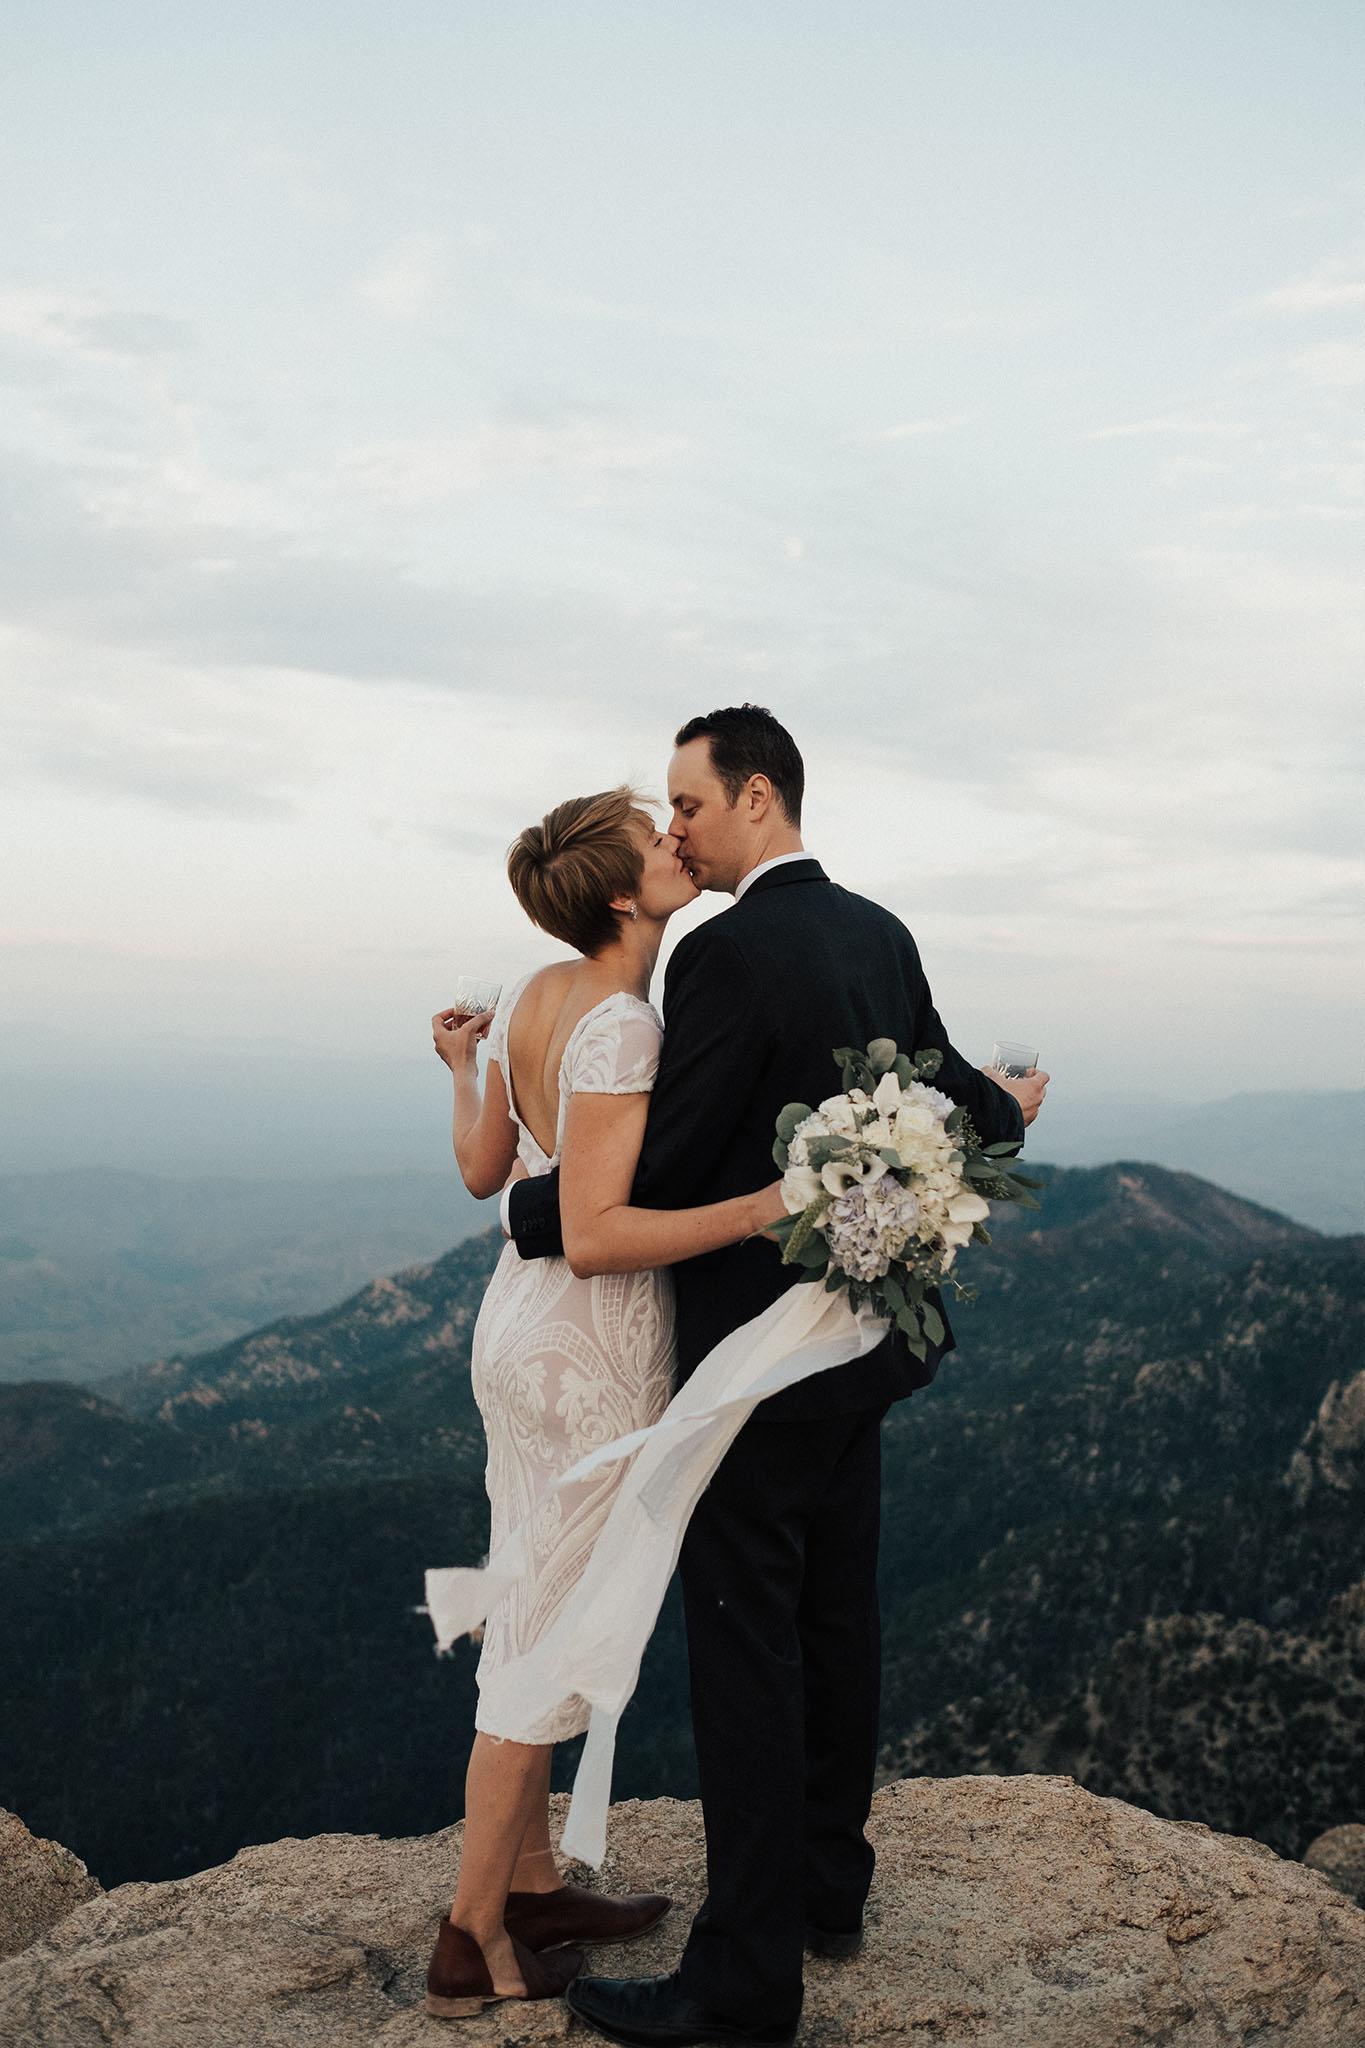 Arizona-Intimate-Elopement-Adventure-Photographer-Mount-Lemmon (31).jpg